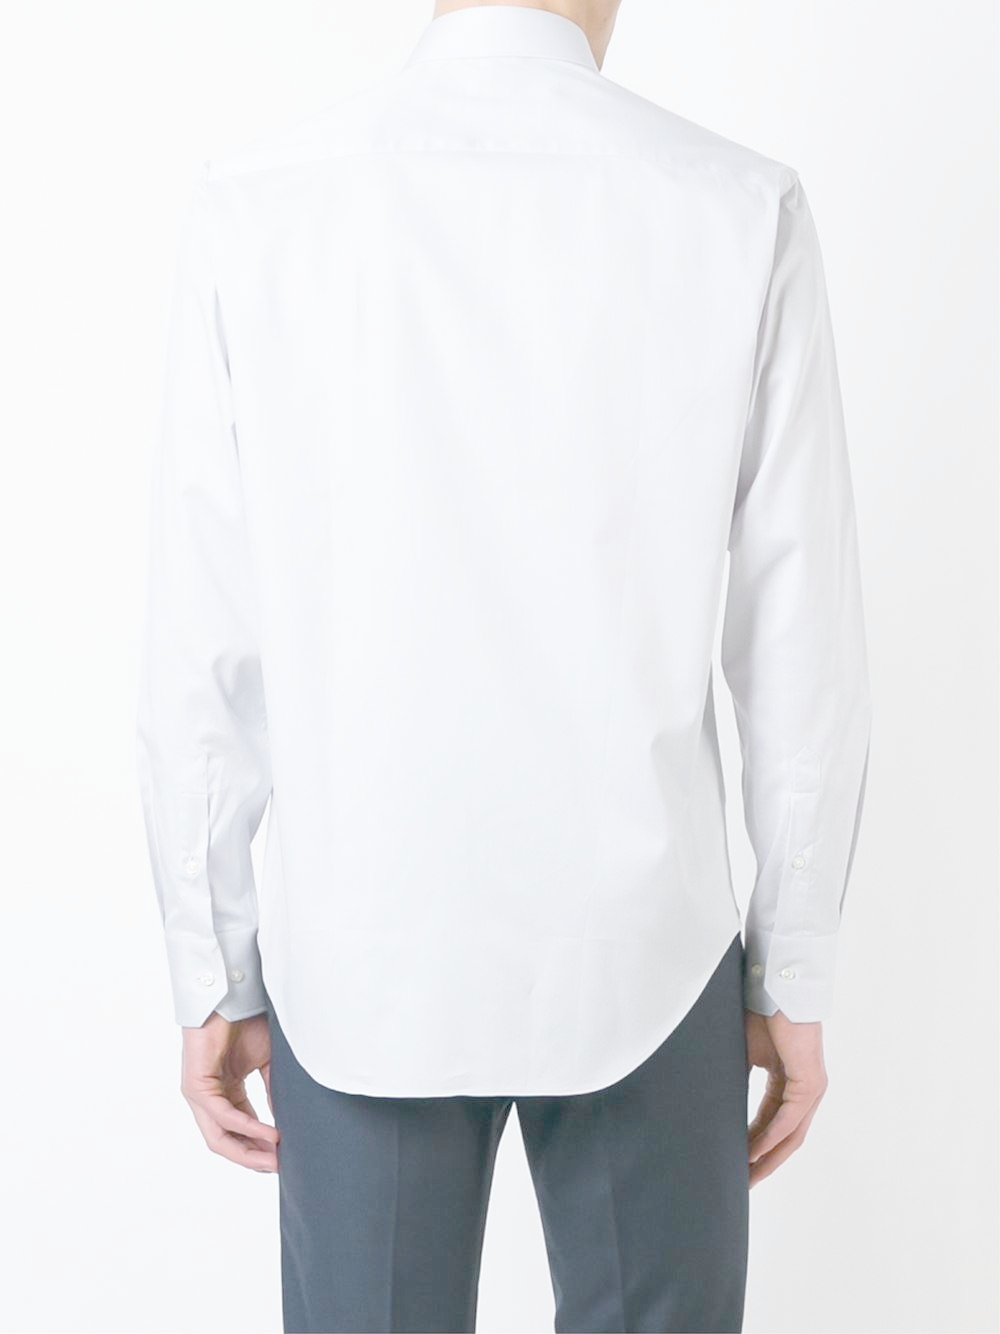 Armani cuffed classic button down dress shirt in gray for for Mens grey button down dress shirt